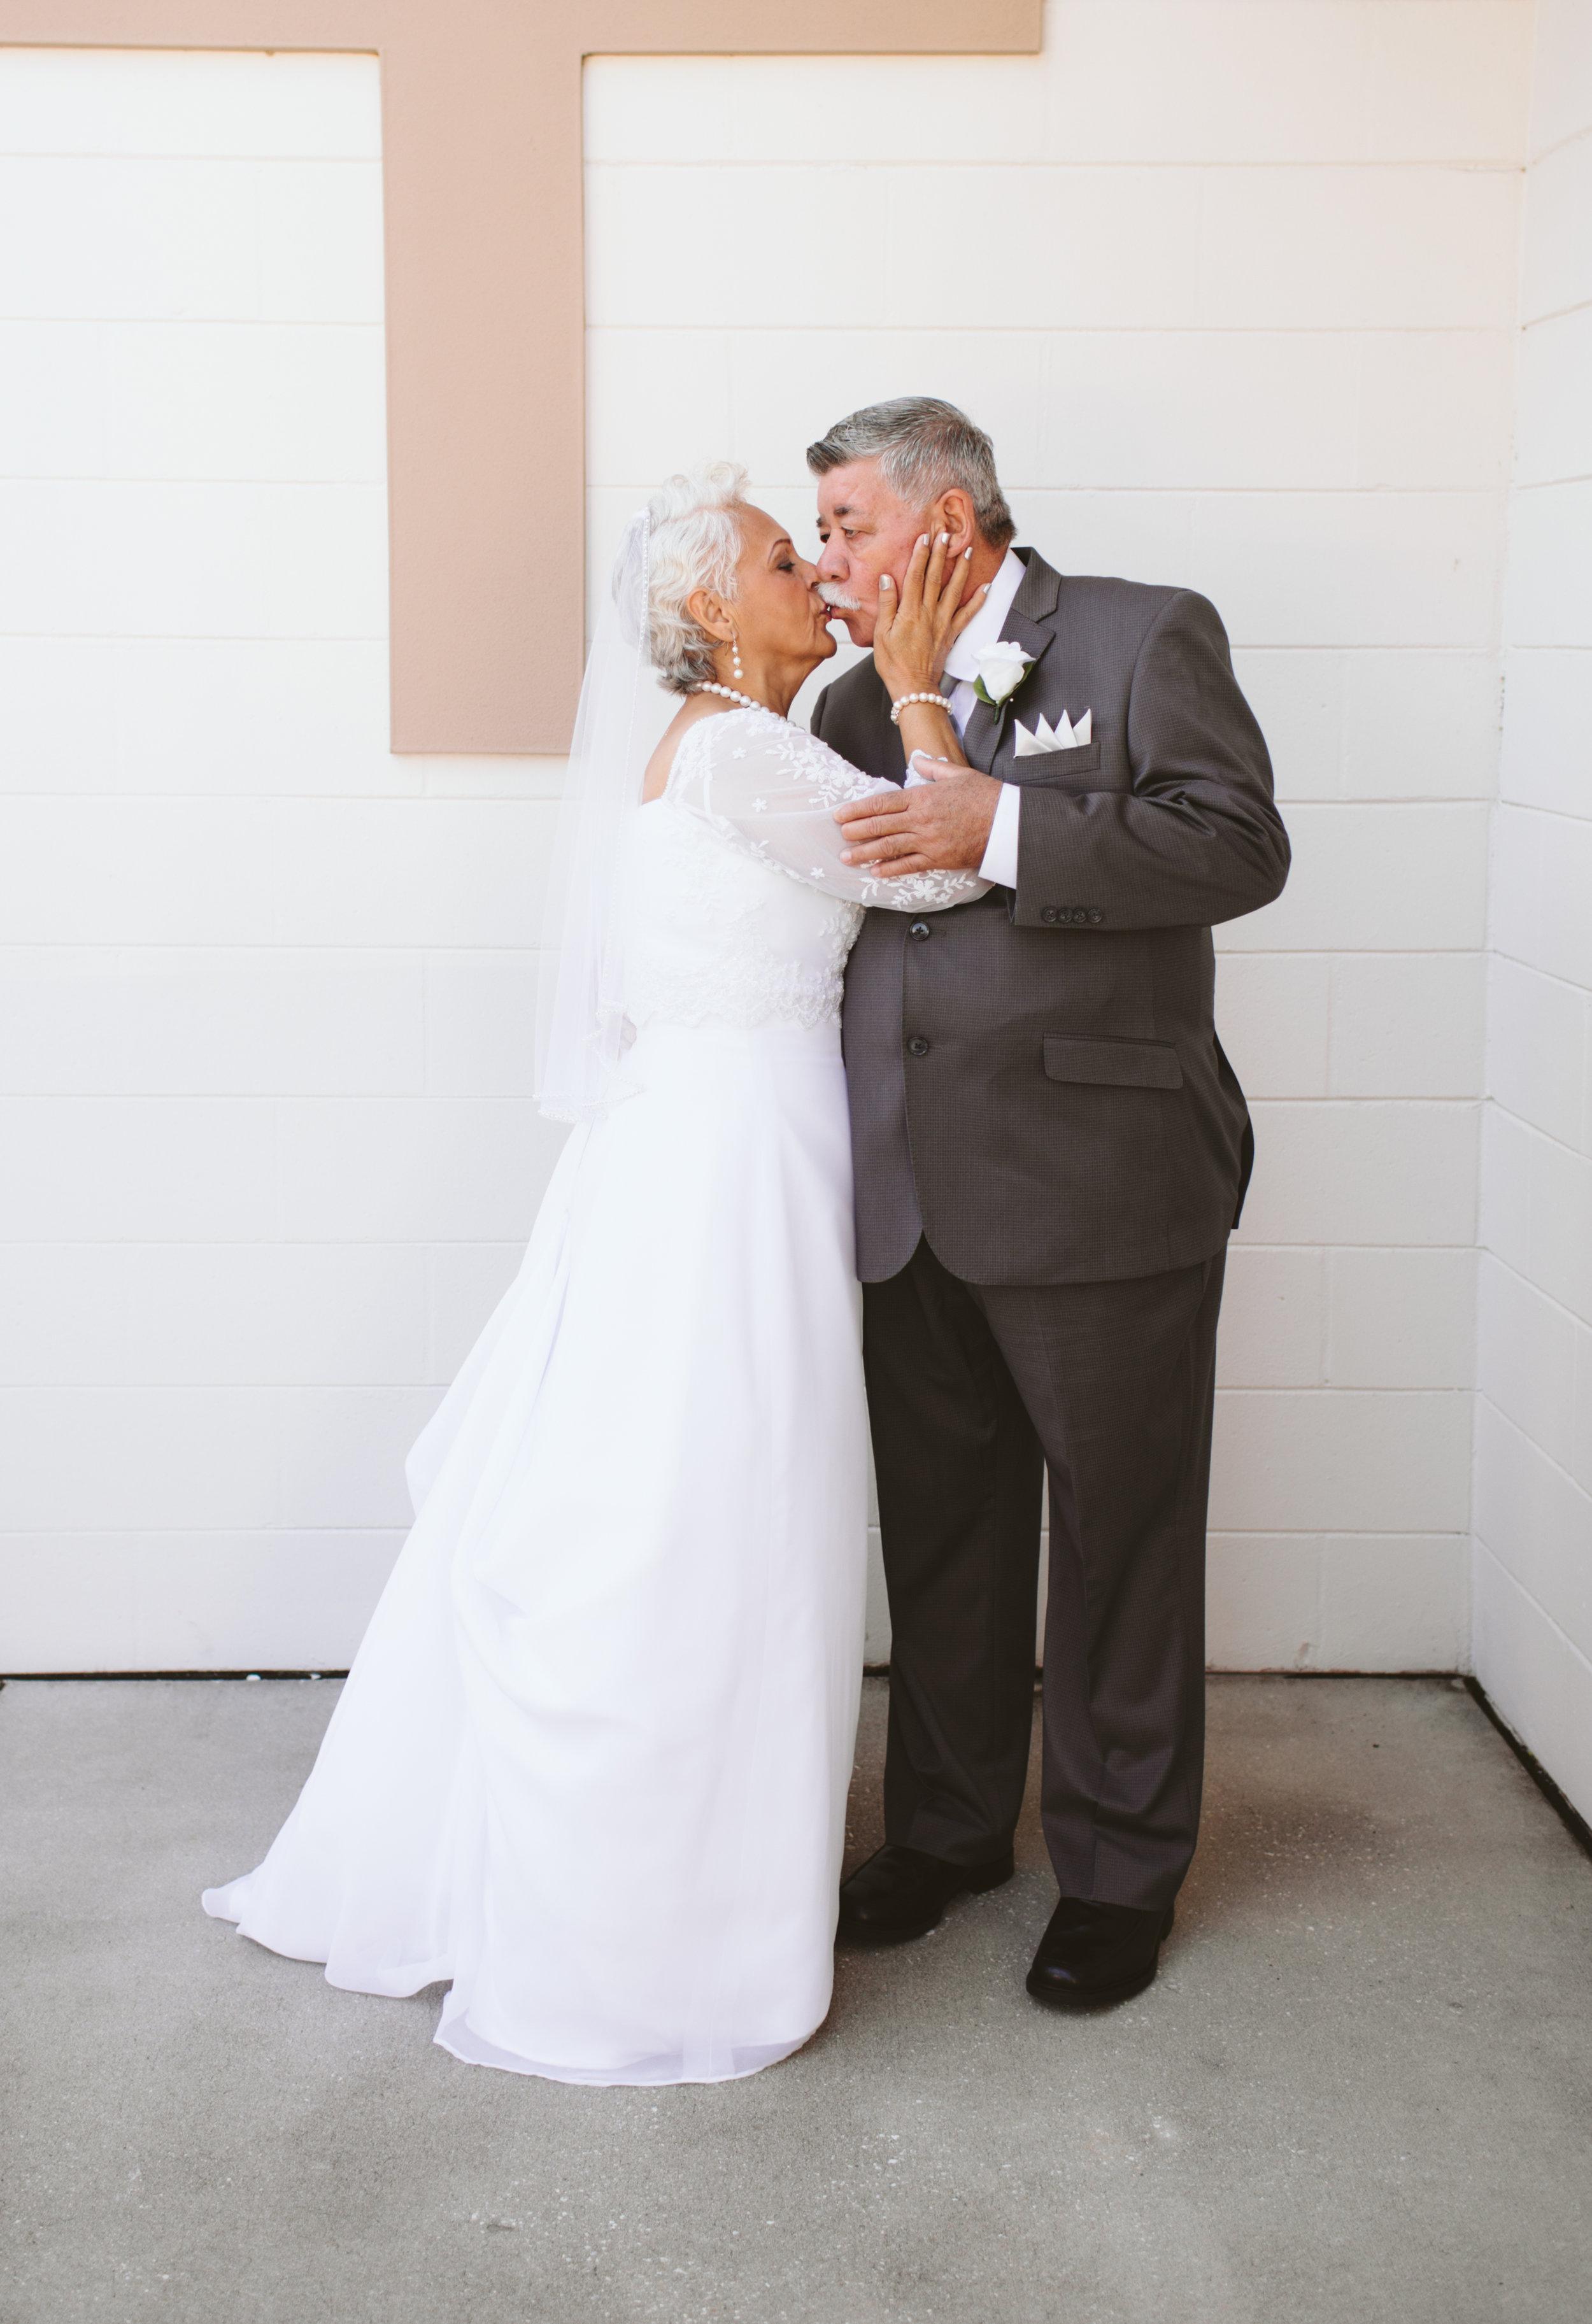 wedding | Vanessa Boy Photography | vanessaboy.com |-68.jpg